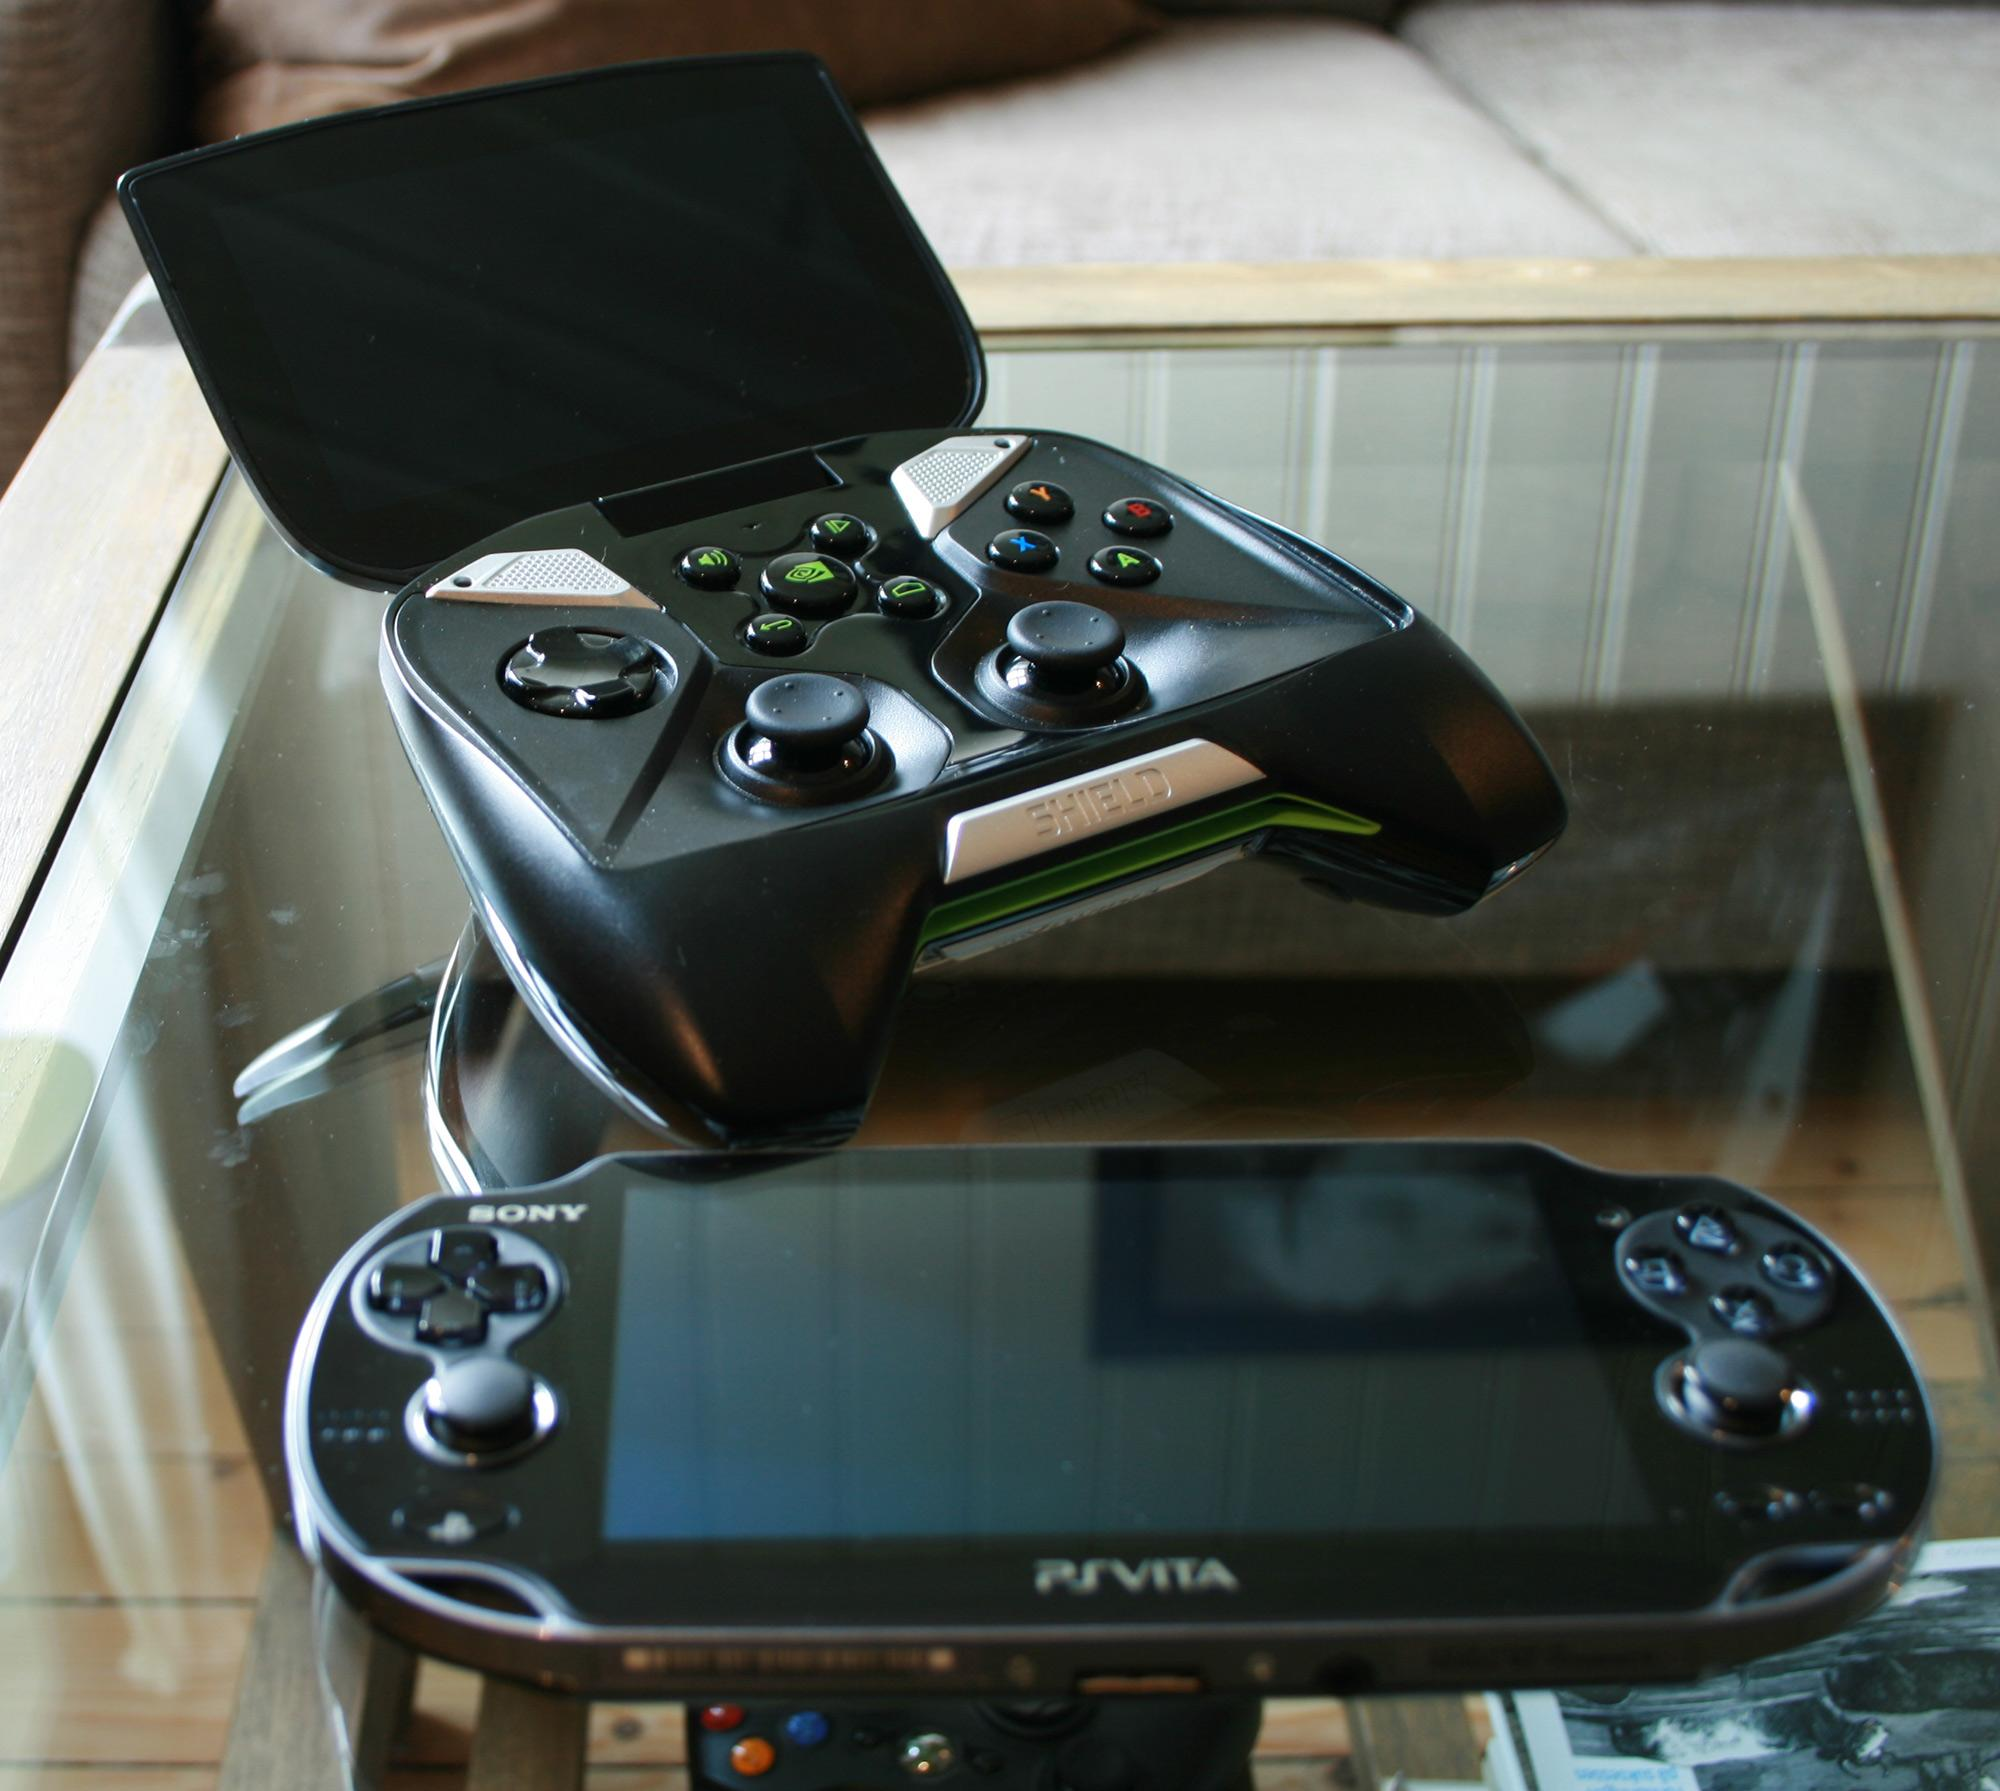 Sonys PlayStation Vita kan også strømme spill over nettverket.Foto: Anders Brattensborg Smedsrud, Hardware.no